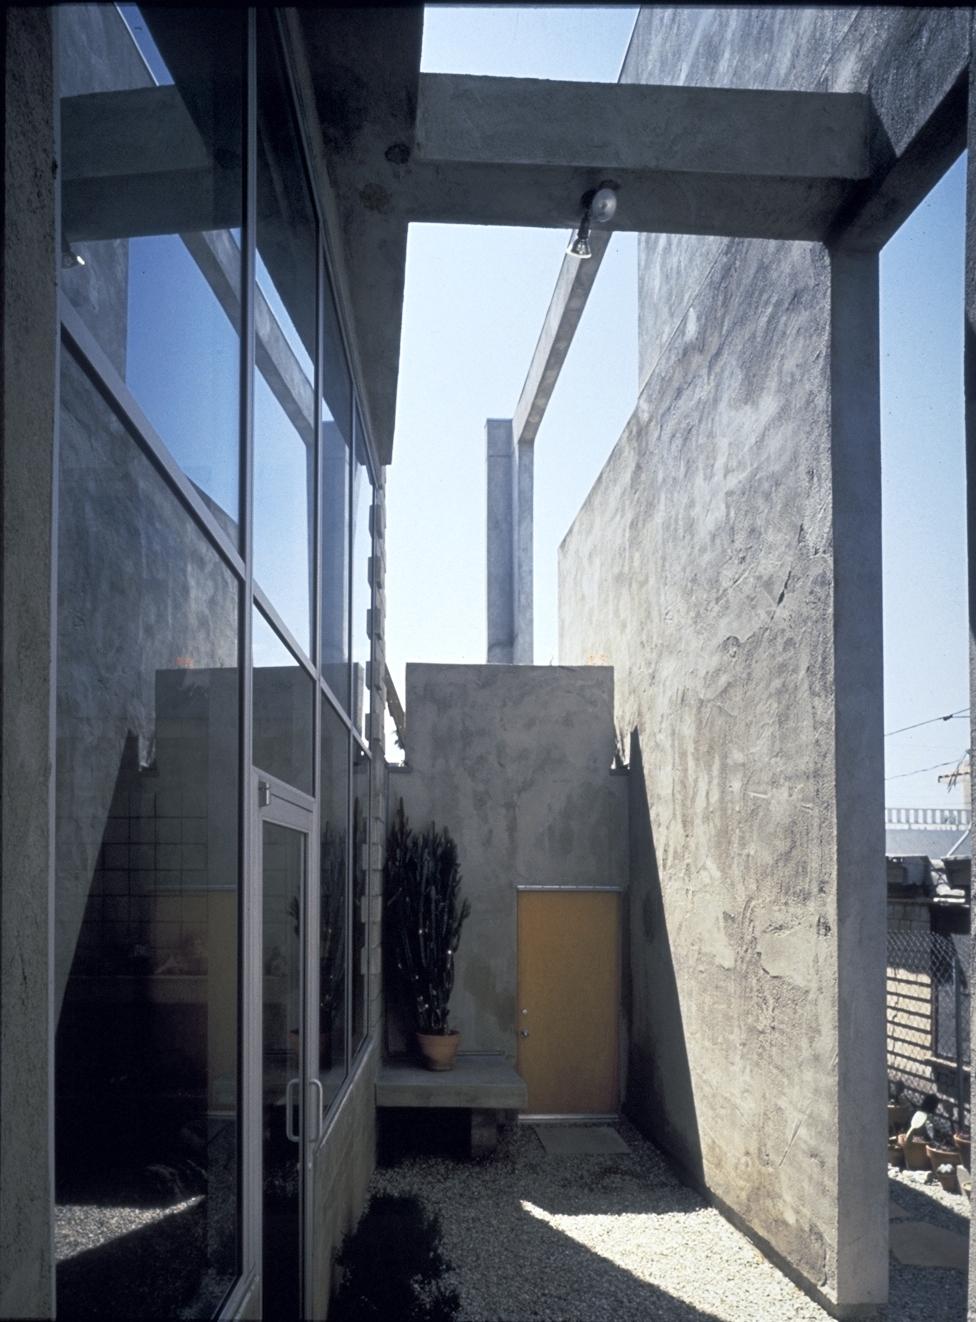 S.E.A.-Studio-Environmental-Architecture-David-Hertz-FAIA-Venable-House-Venice-Beach-sustainable-regenerative-restorative-design-residential-contemporary-modern-passive-systems-recycled-wood-concrete-green-building-canal-beachhouse-studioea-9.jpg